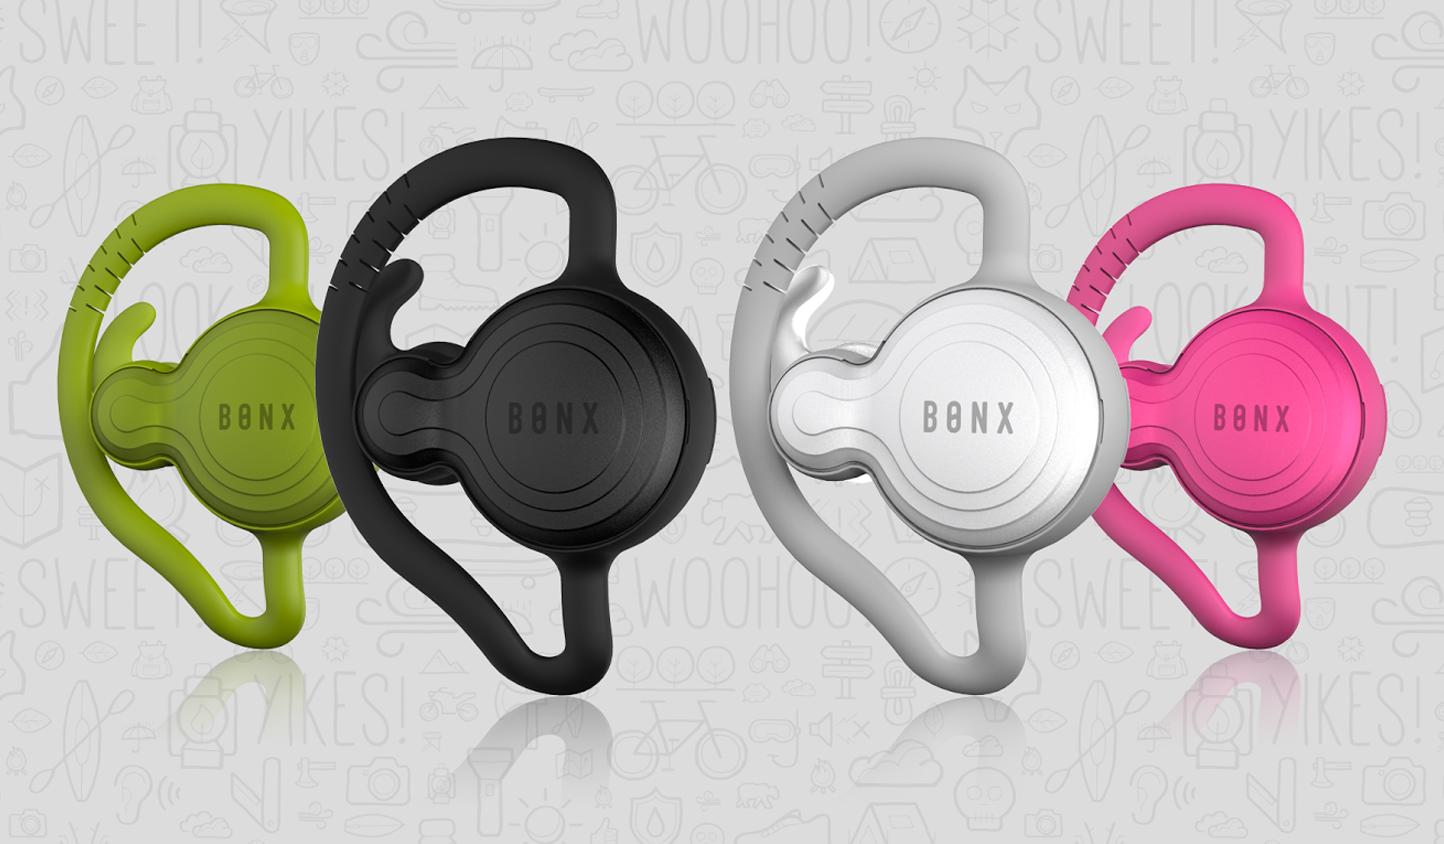 Bonx Grip Bluetooth earpiece